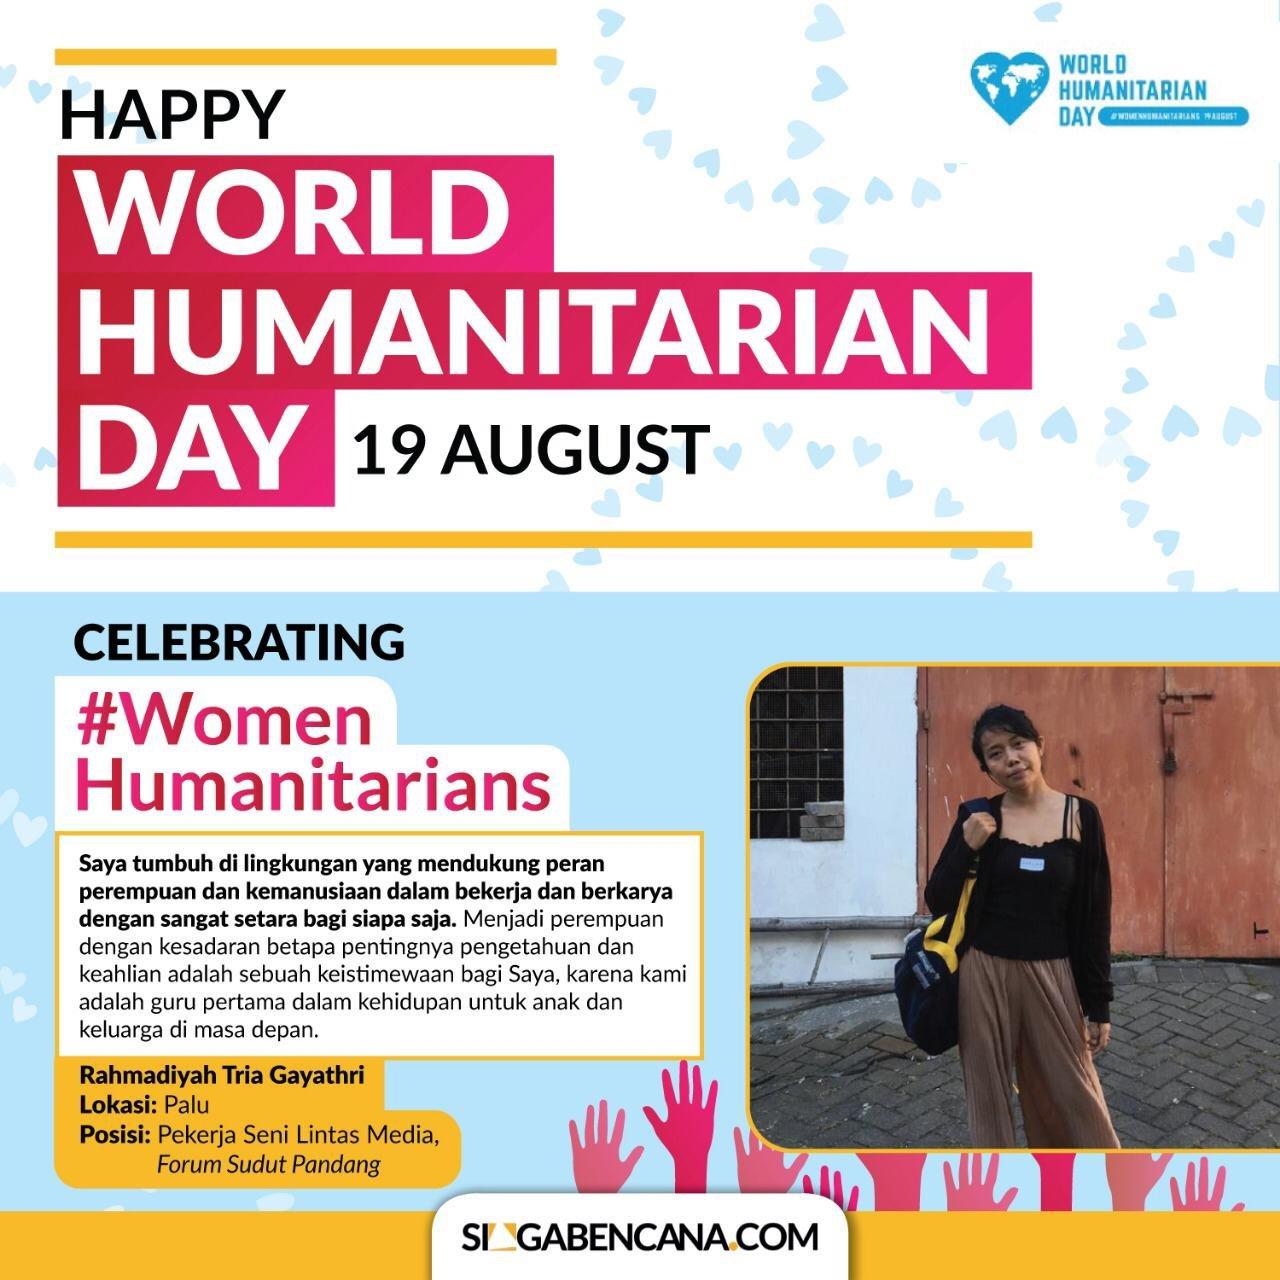 Happy World Humanitarian Day